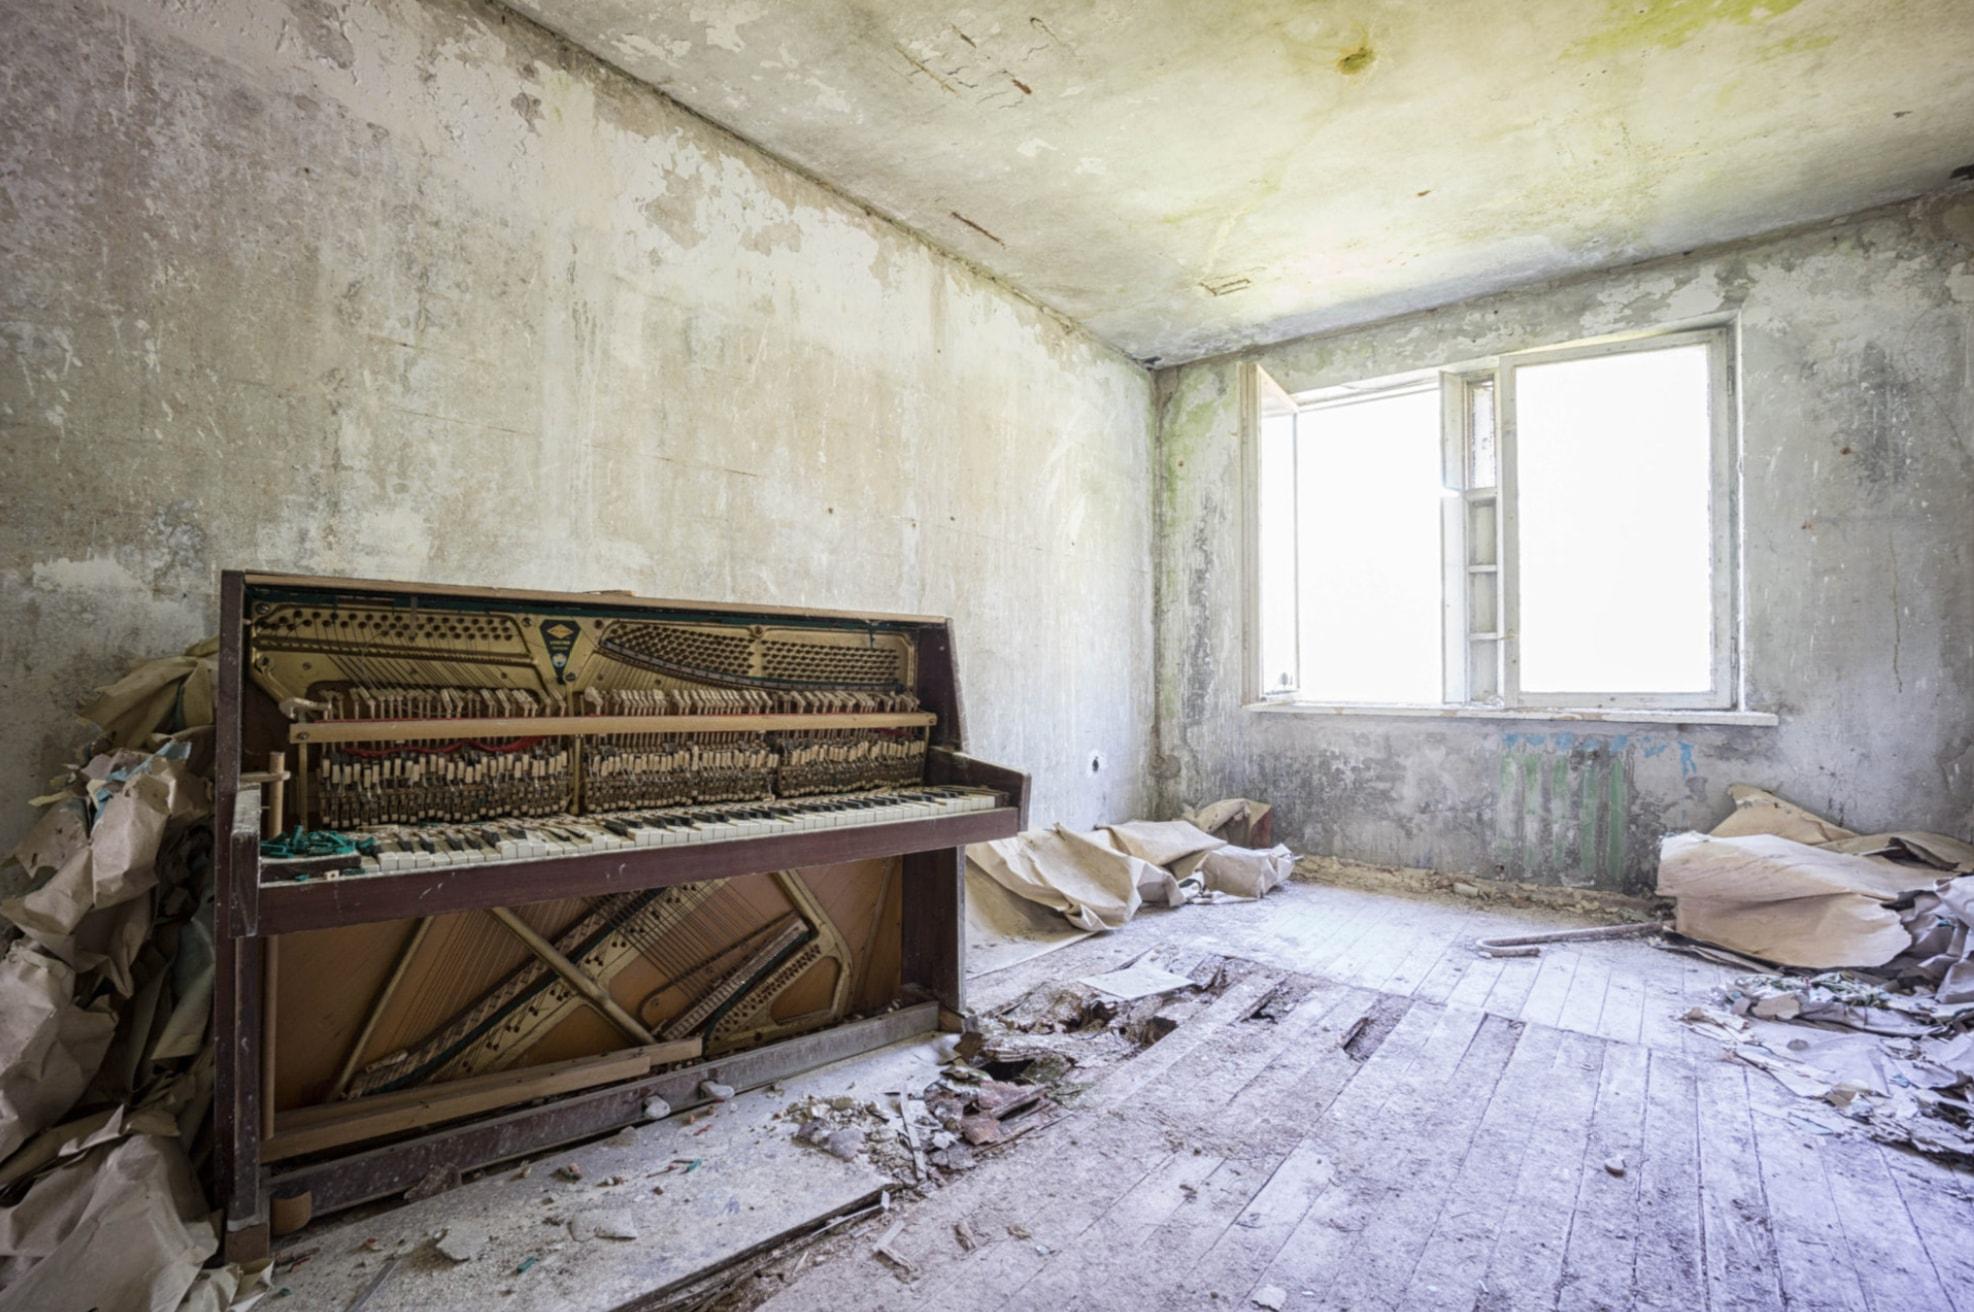 pianos12-1